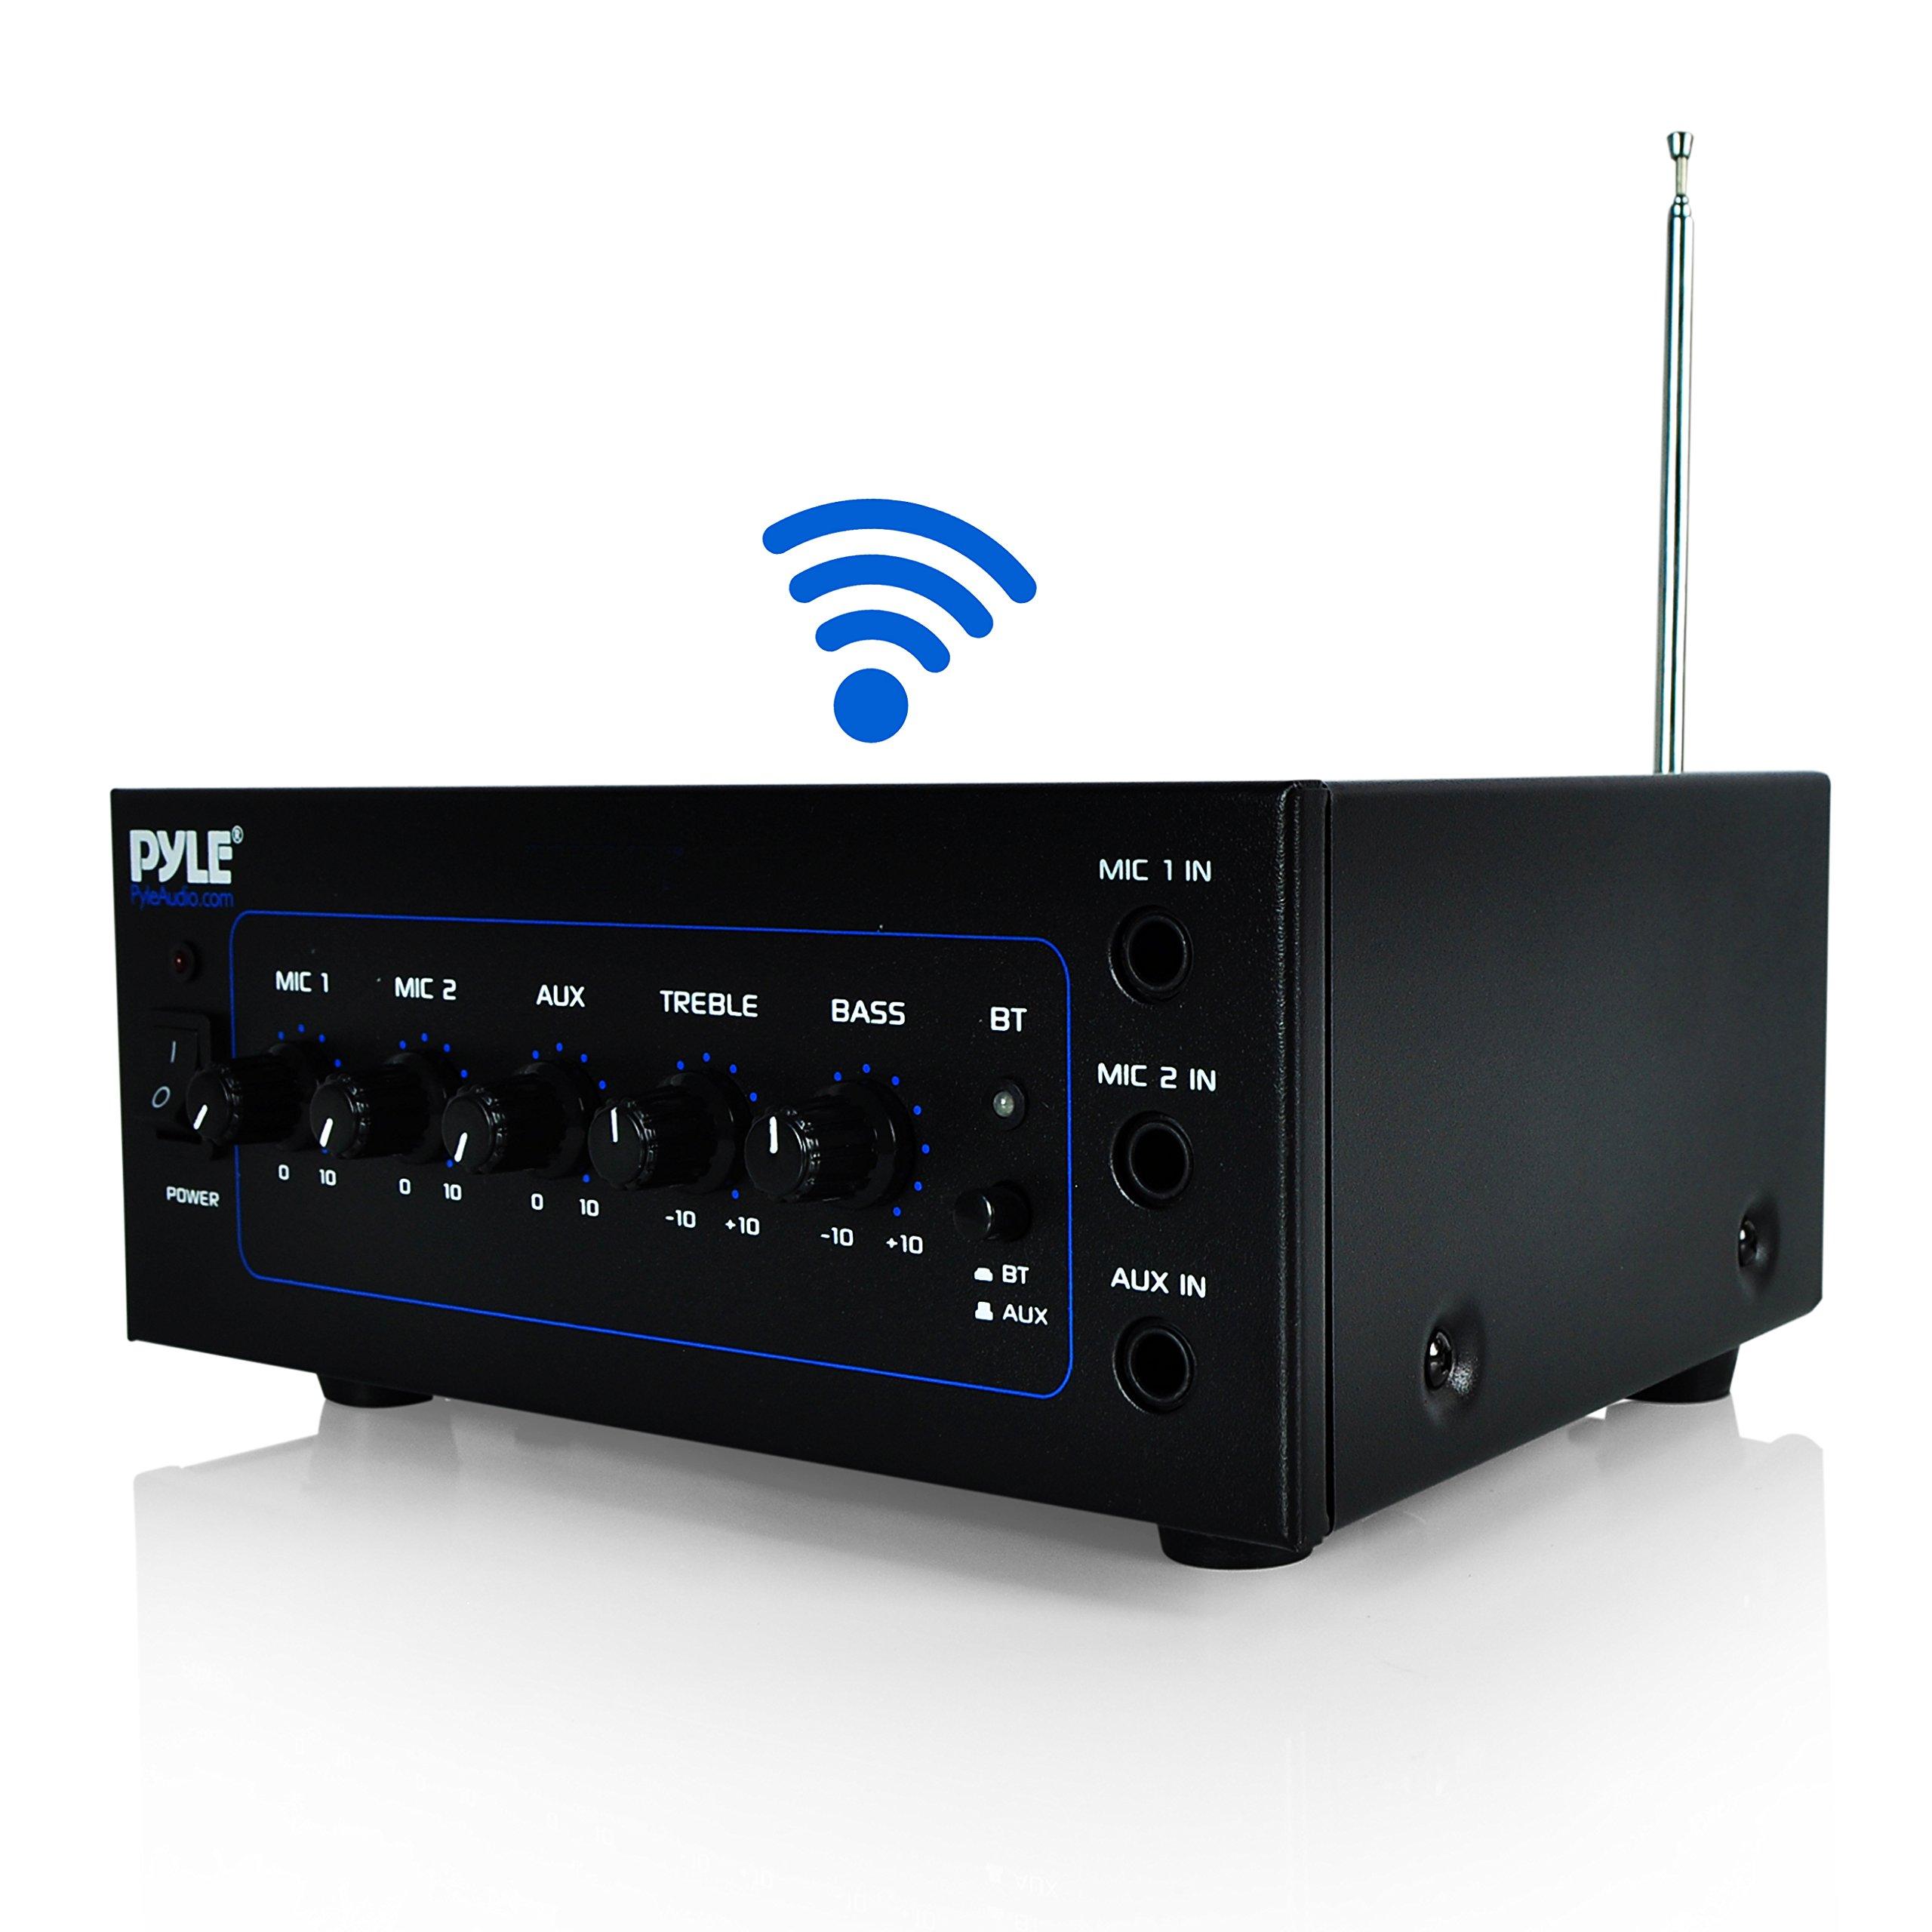 Upgraded Version Pyle Bluetooth Speaker Amplifier   Power Amp W Wireless Streaming   40 Watt W 2 Microphone Inputs   Mic Talkover   Transformers Speaker Output: 25V/70V   DJ Equipment (PCM211BT)